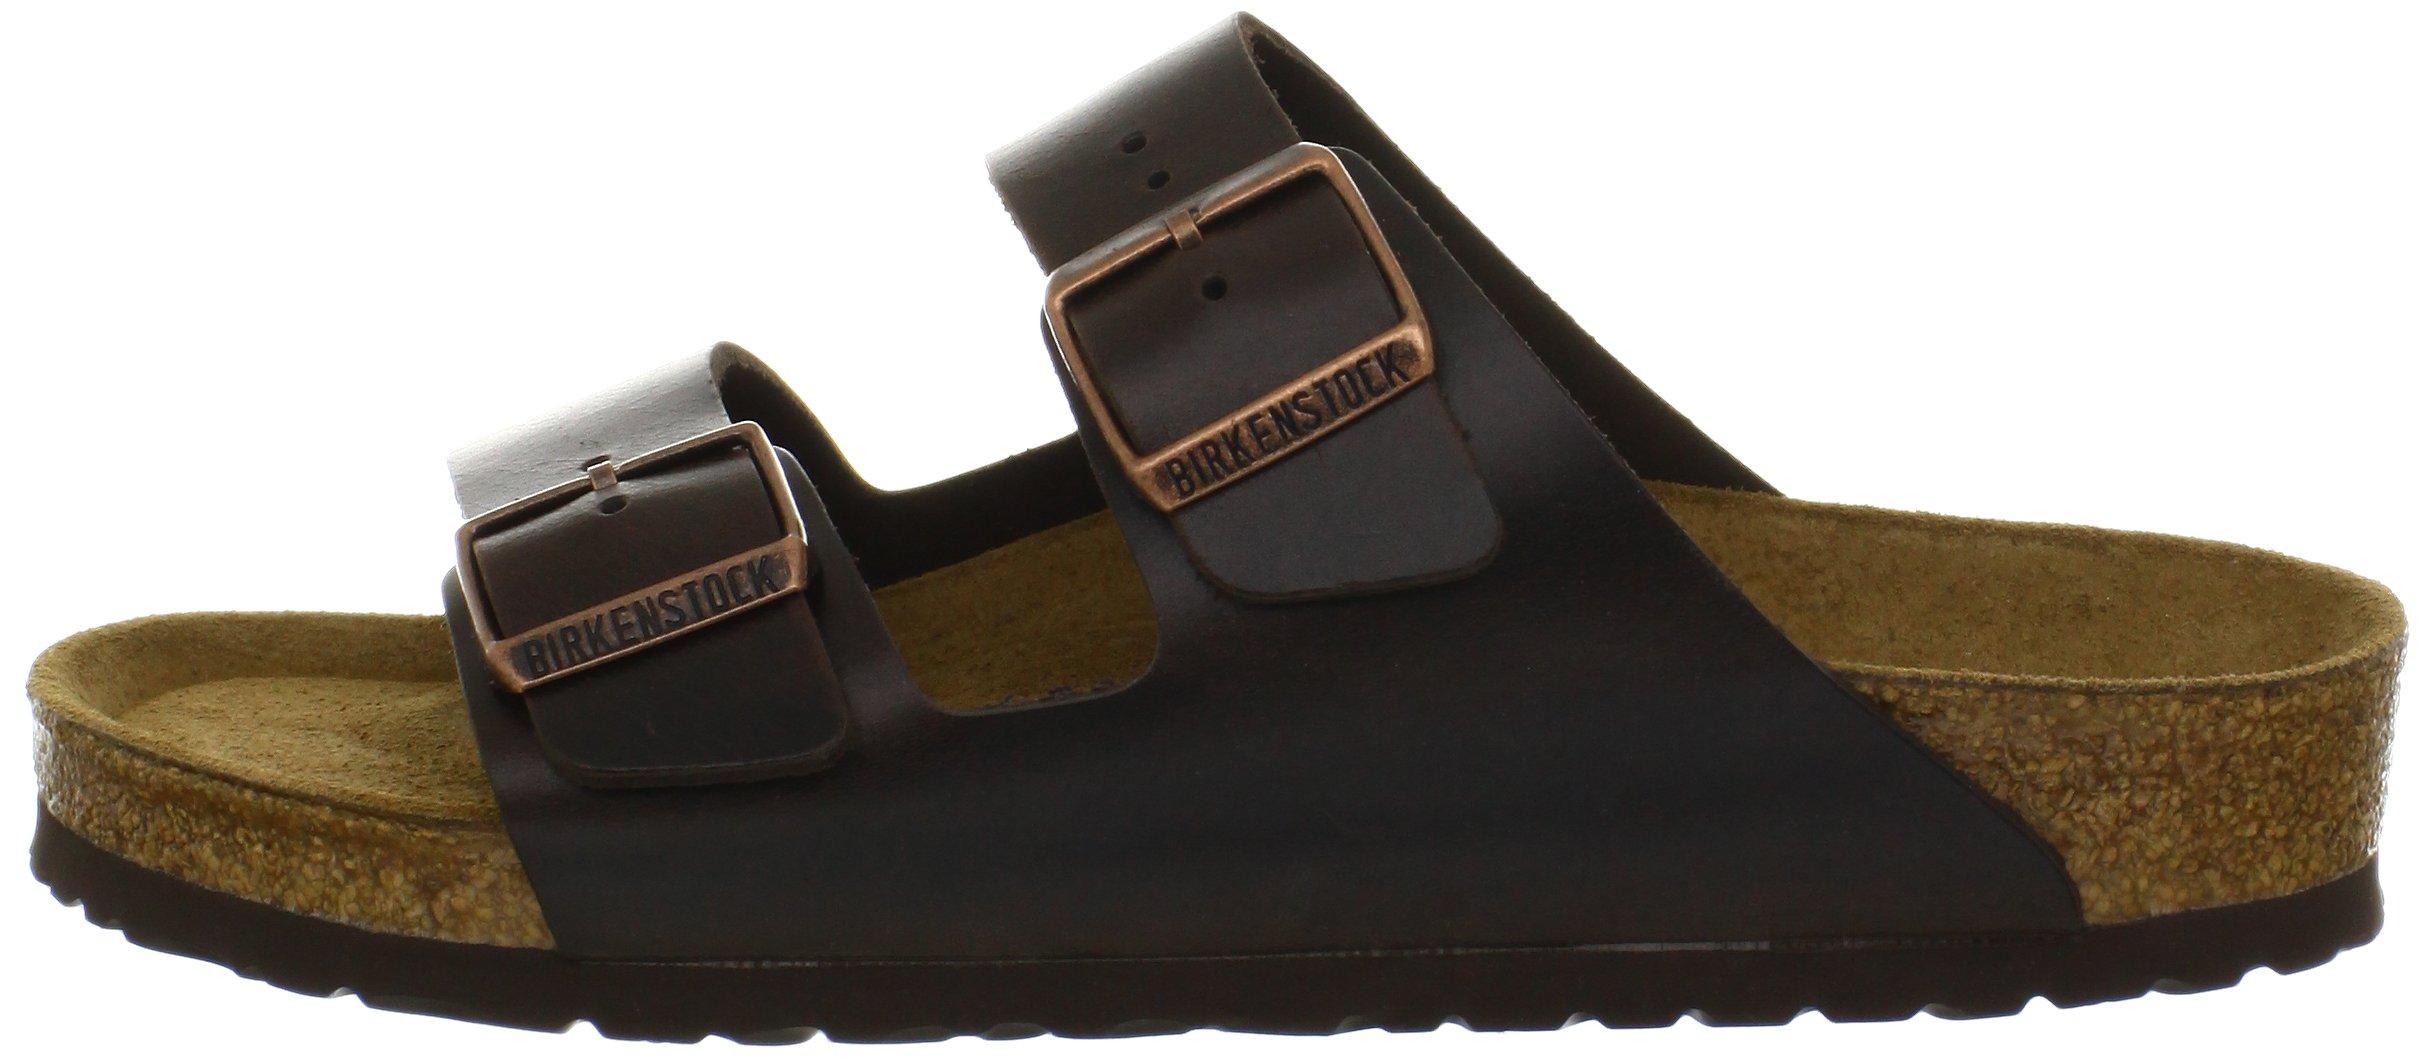 Birkenstock Unisex Arizona Brown Amalfi Leather Sandals - 39 M EU / 8-8.5 B(M) US by Birkenstock (Image #5)